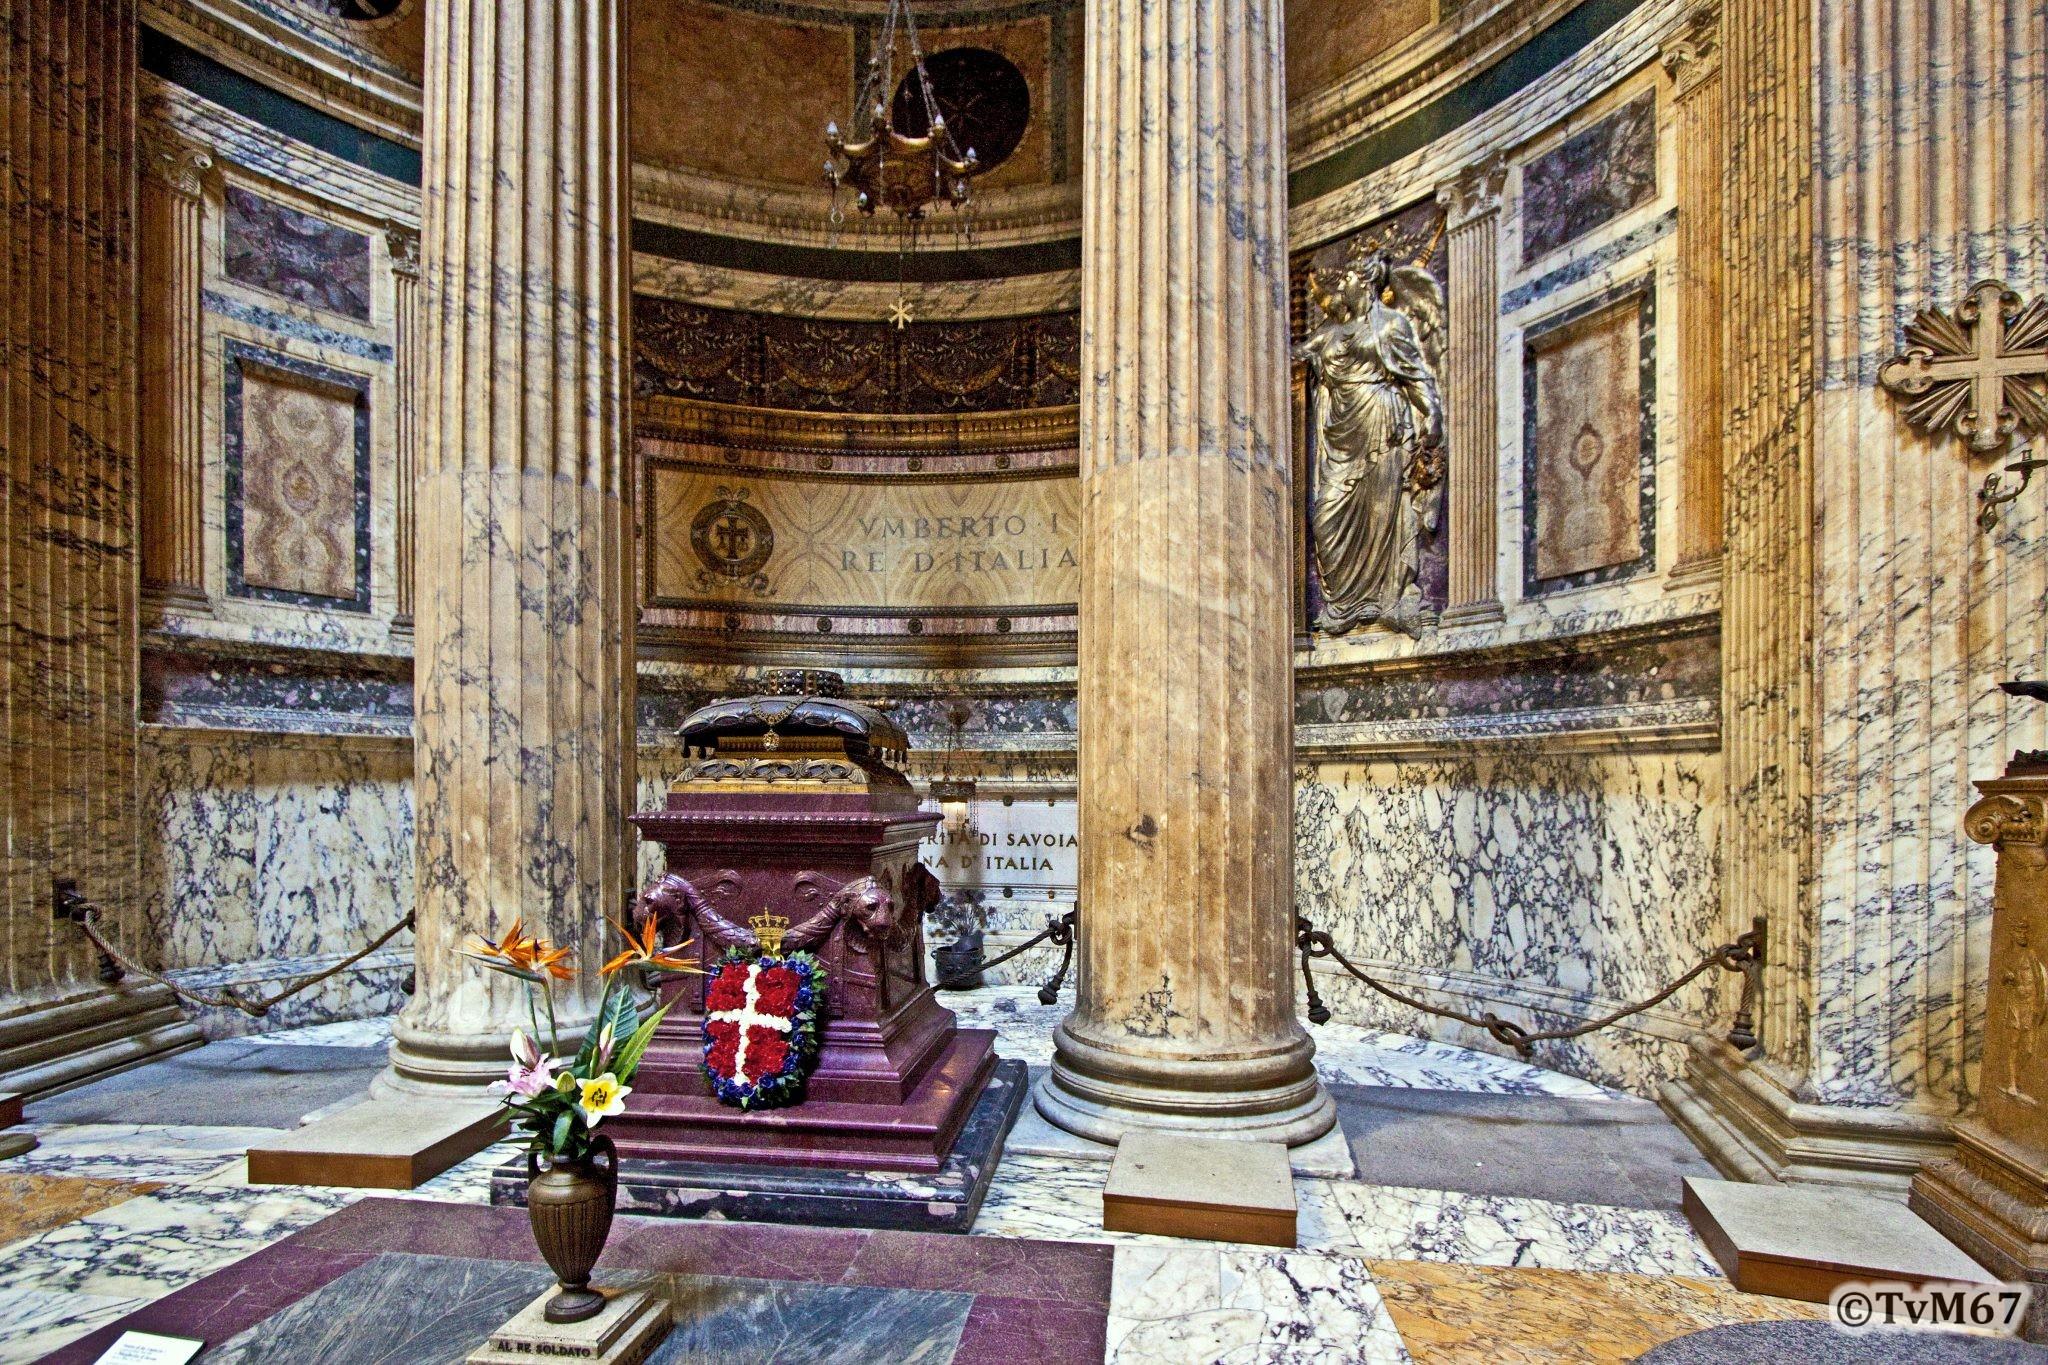 6e kapel, Scacconi, Monument van koning UmbertoI en koningin Margherita